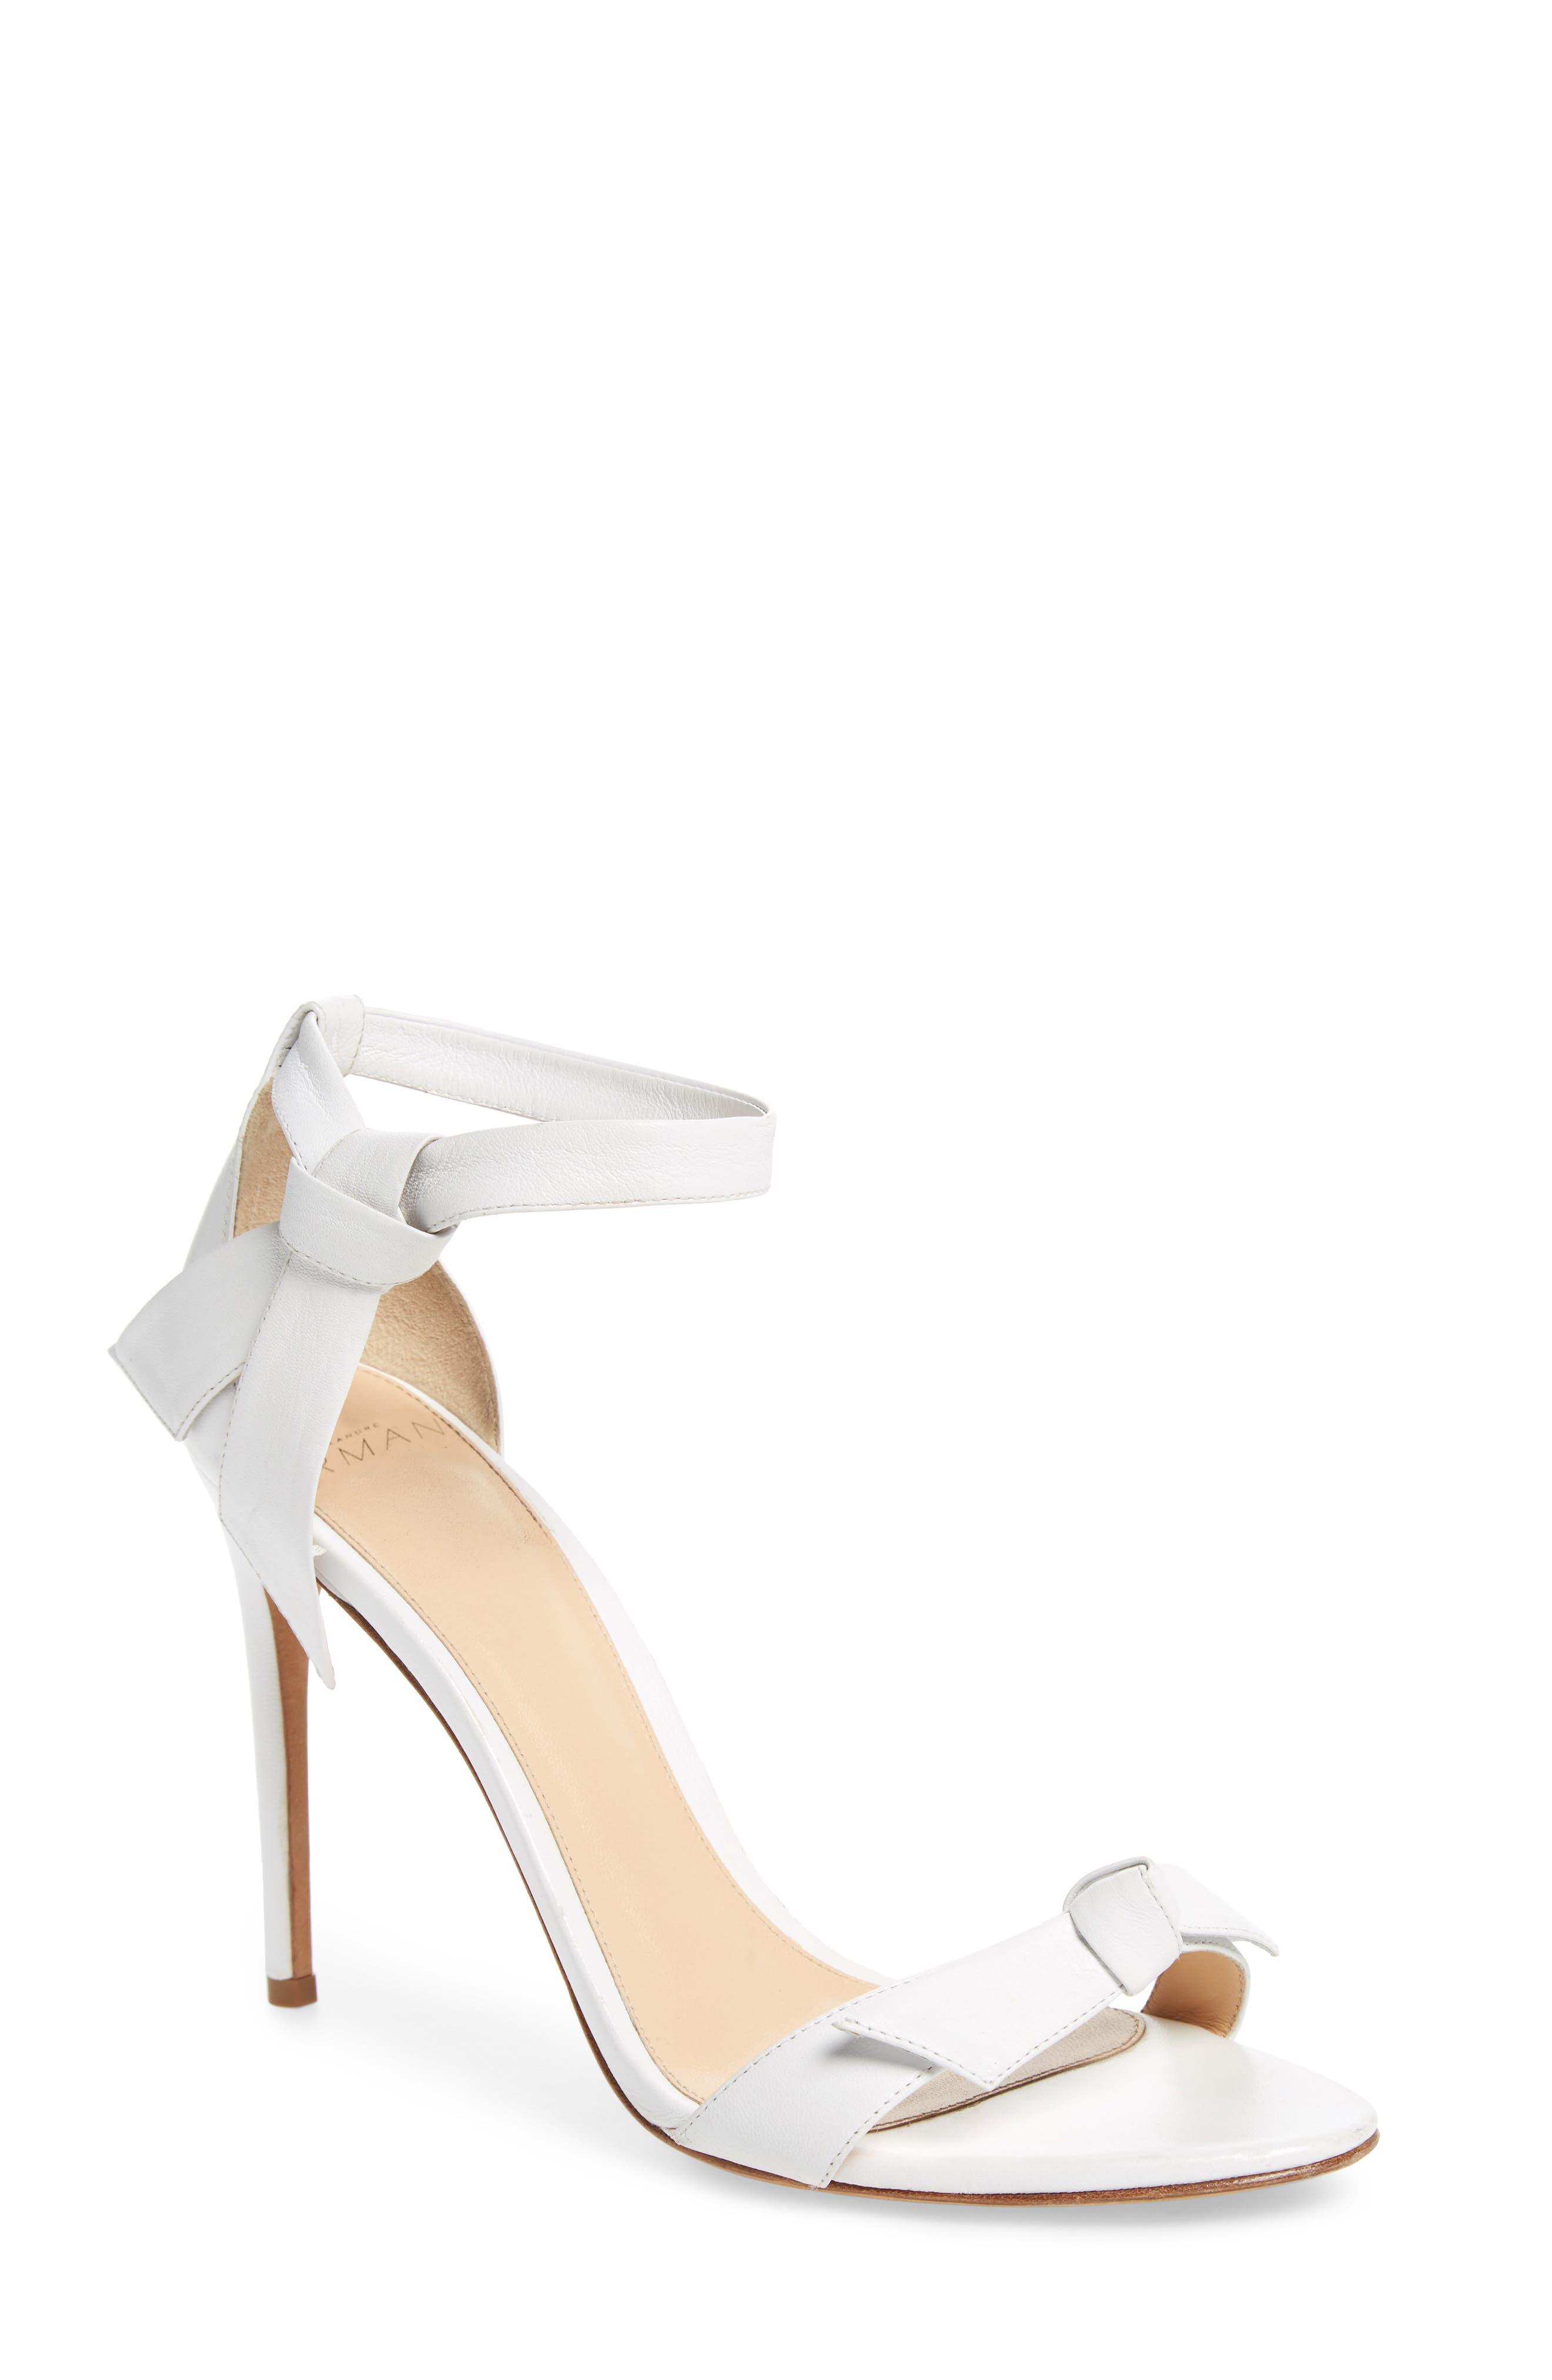 ALEXANDRE BIRMAN, 'Clarita' Ankle Tie Sandal, Main thumbnail 1, color, WHITE LEATHER